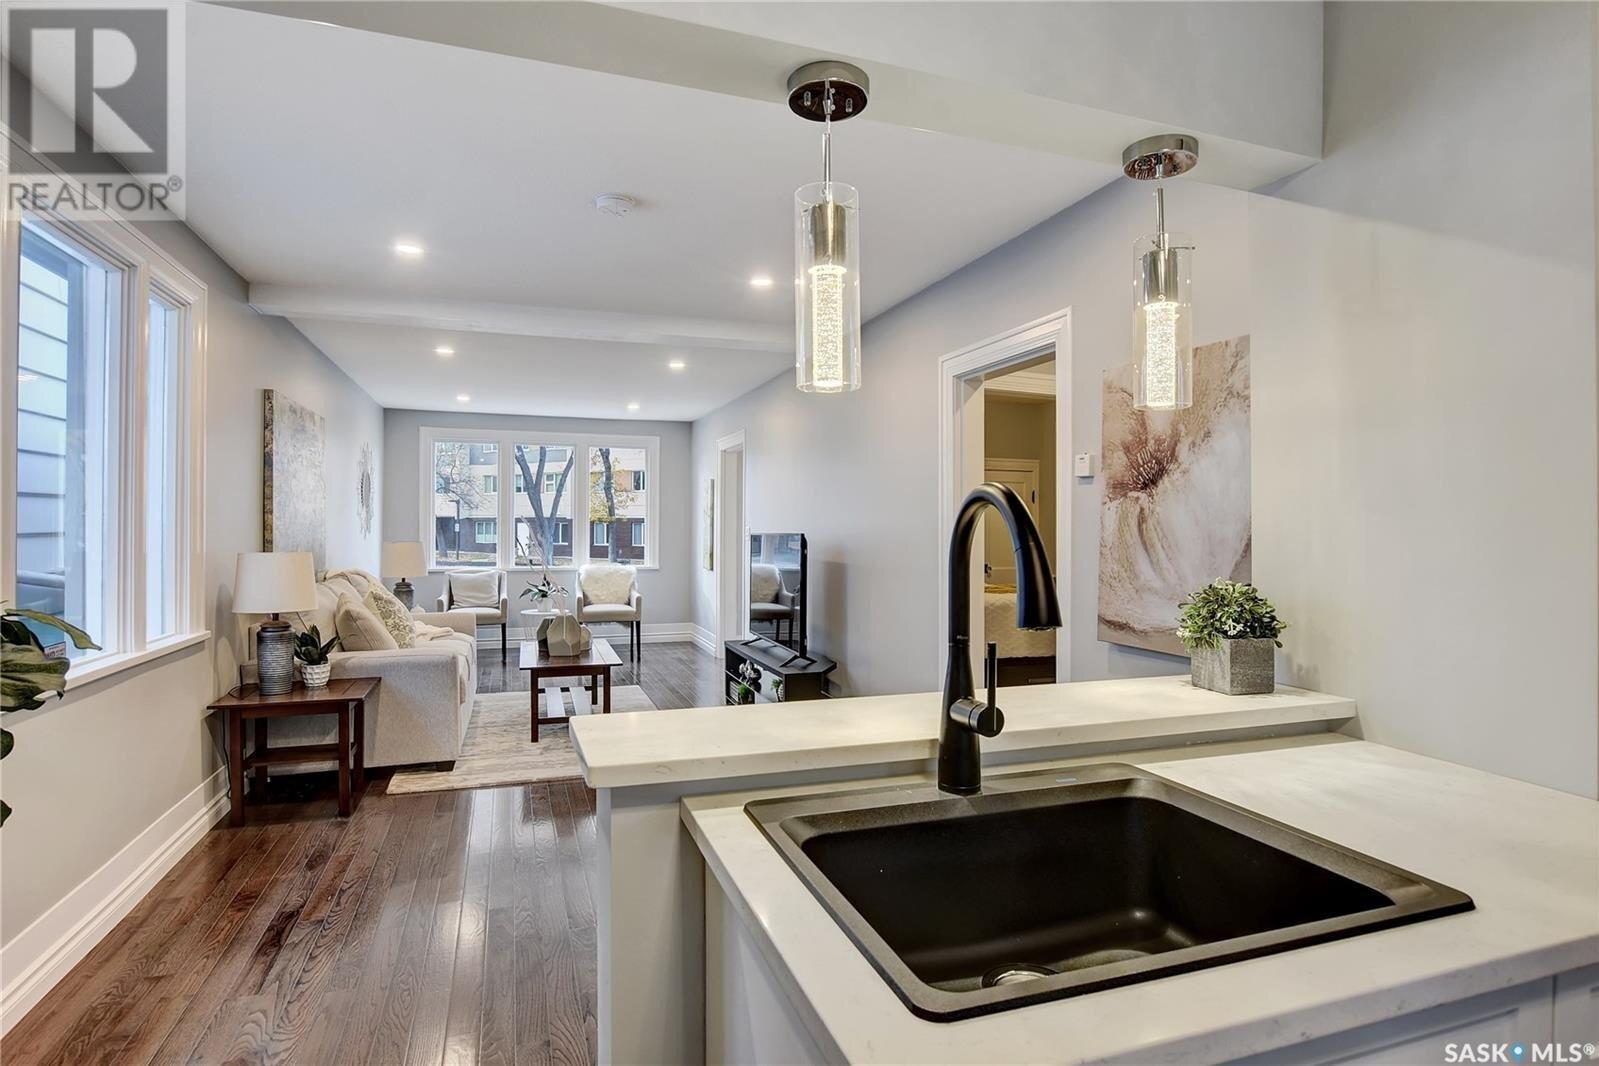 House for sale at 2115 Winnipeg St Regina Saskatchewan - MLS: SK830477